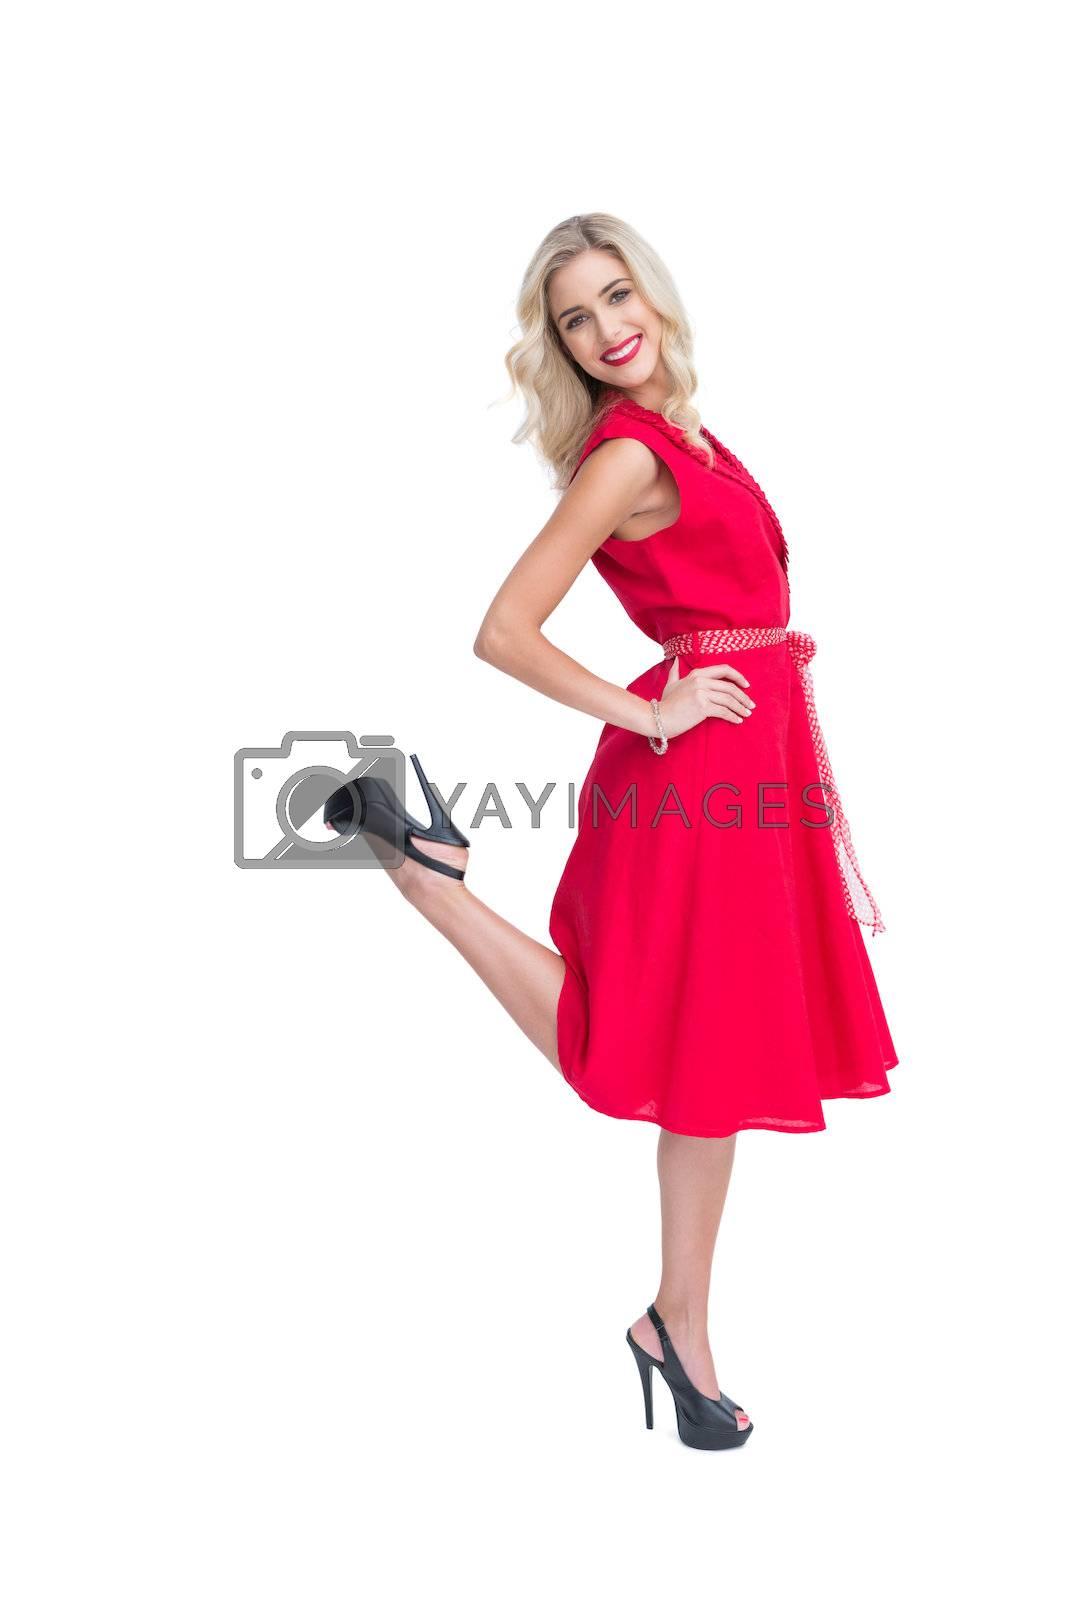 Blonde glamorous woman smiling at camera by Wavebreakmedia